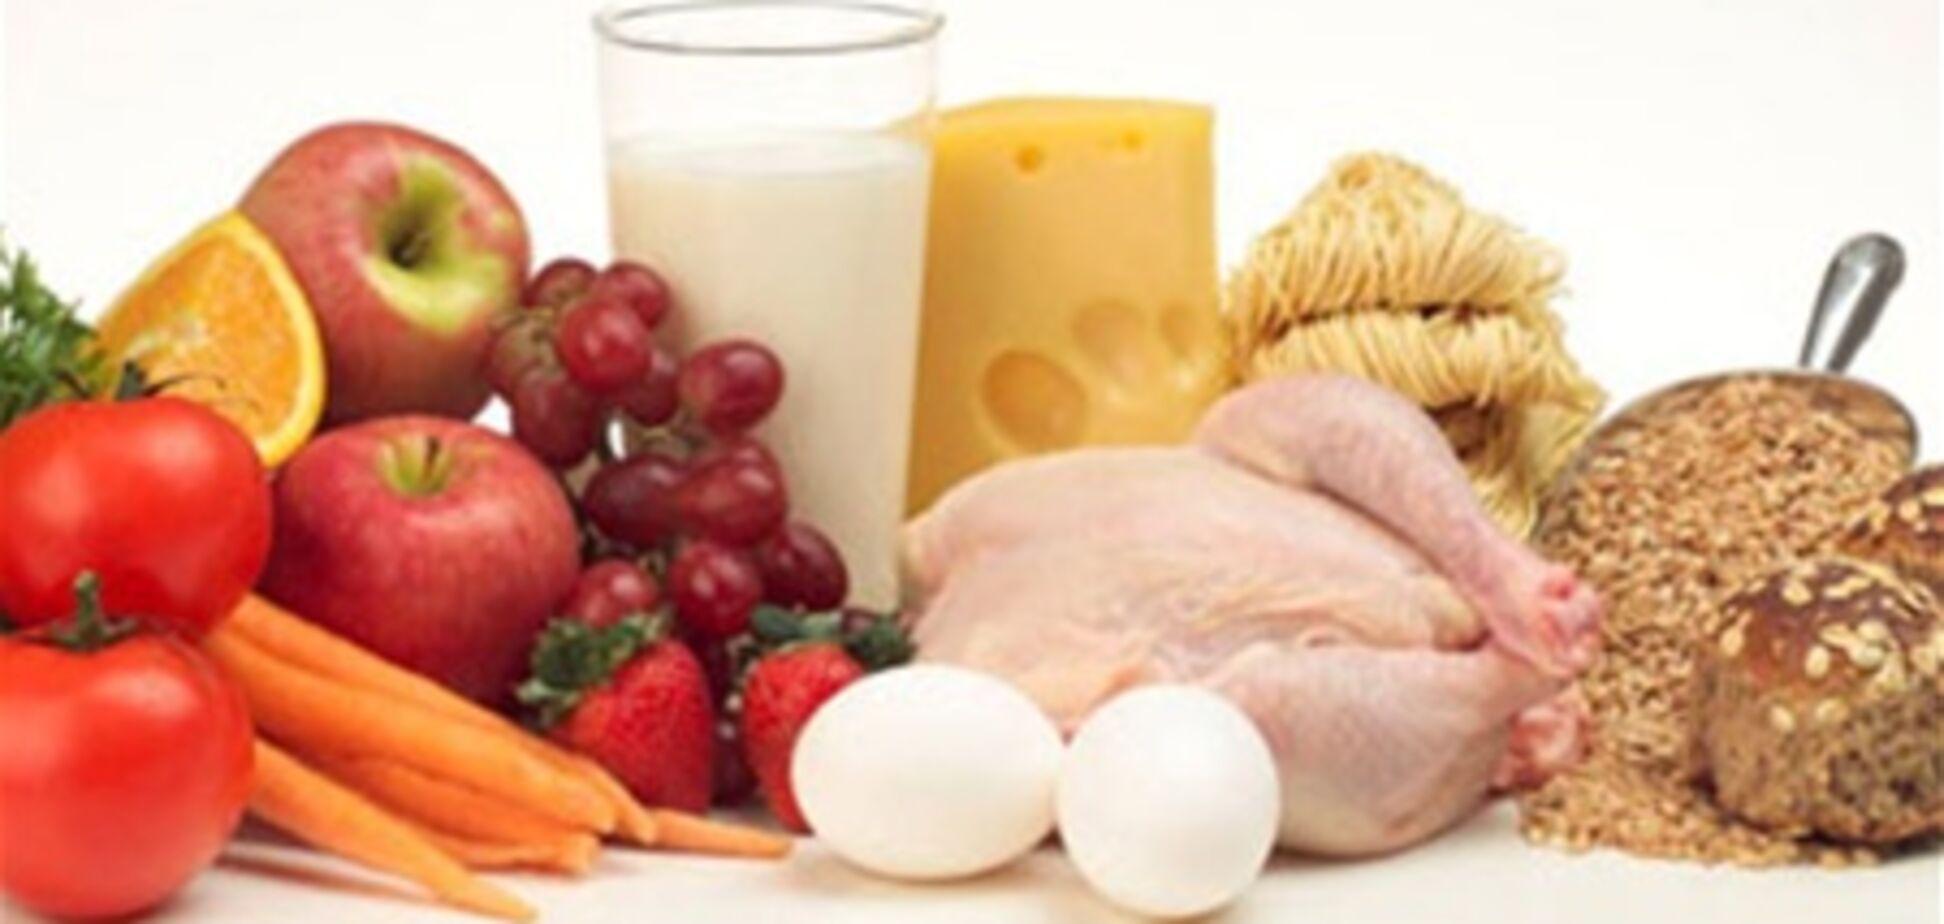 Украинцы съели 541 млрд гривен - эксперт